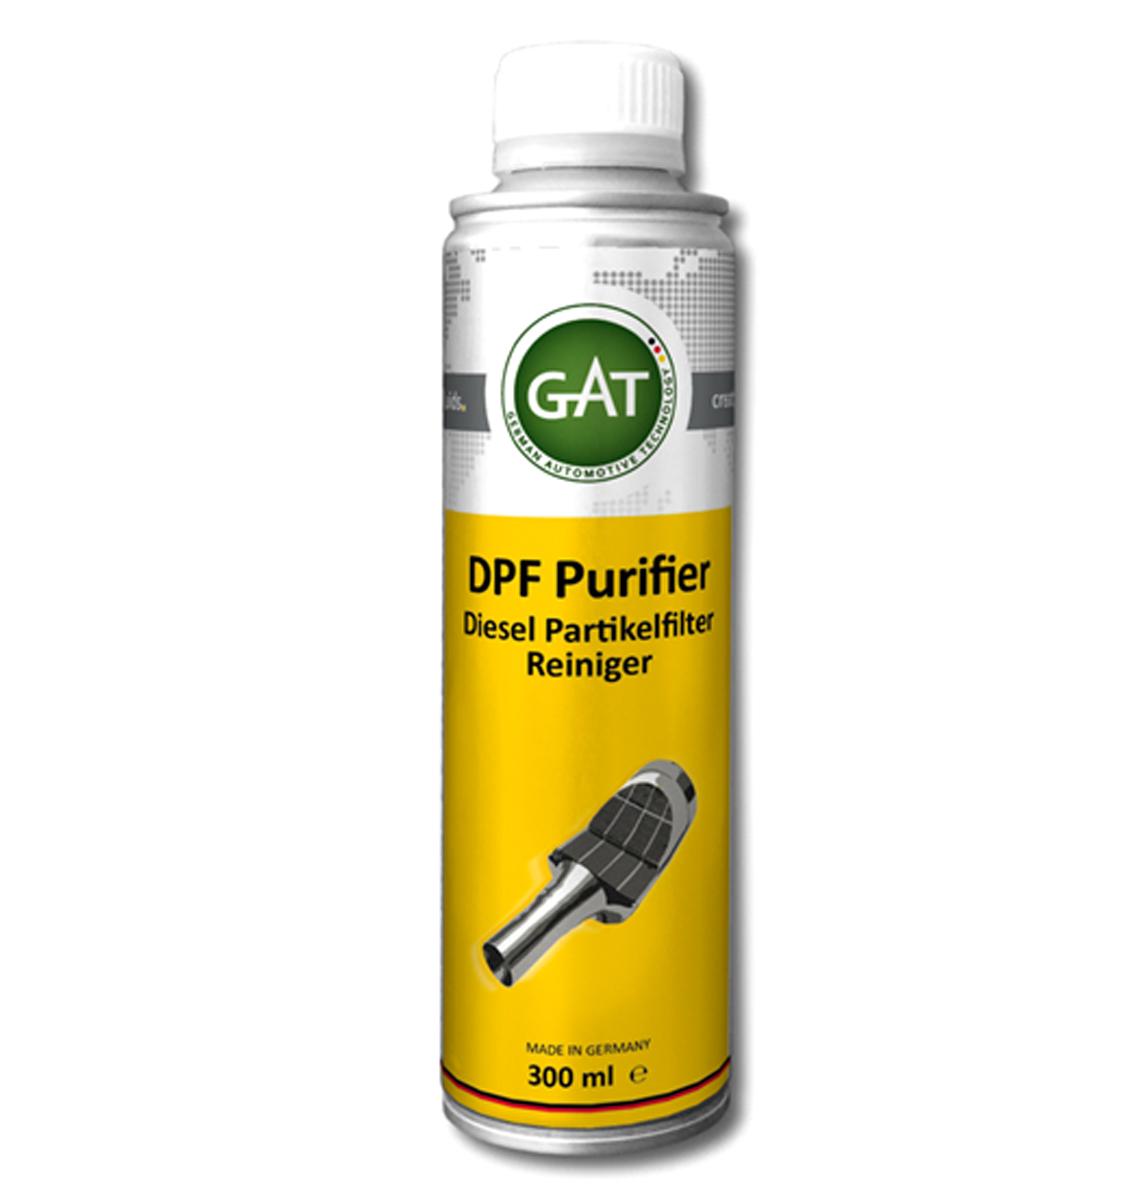 DPF Purifier 300ml